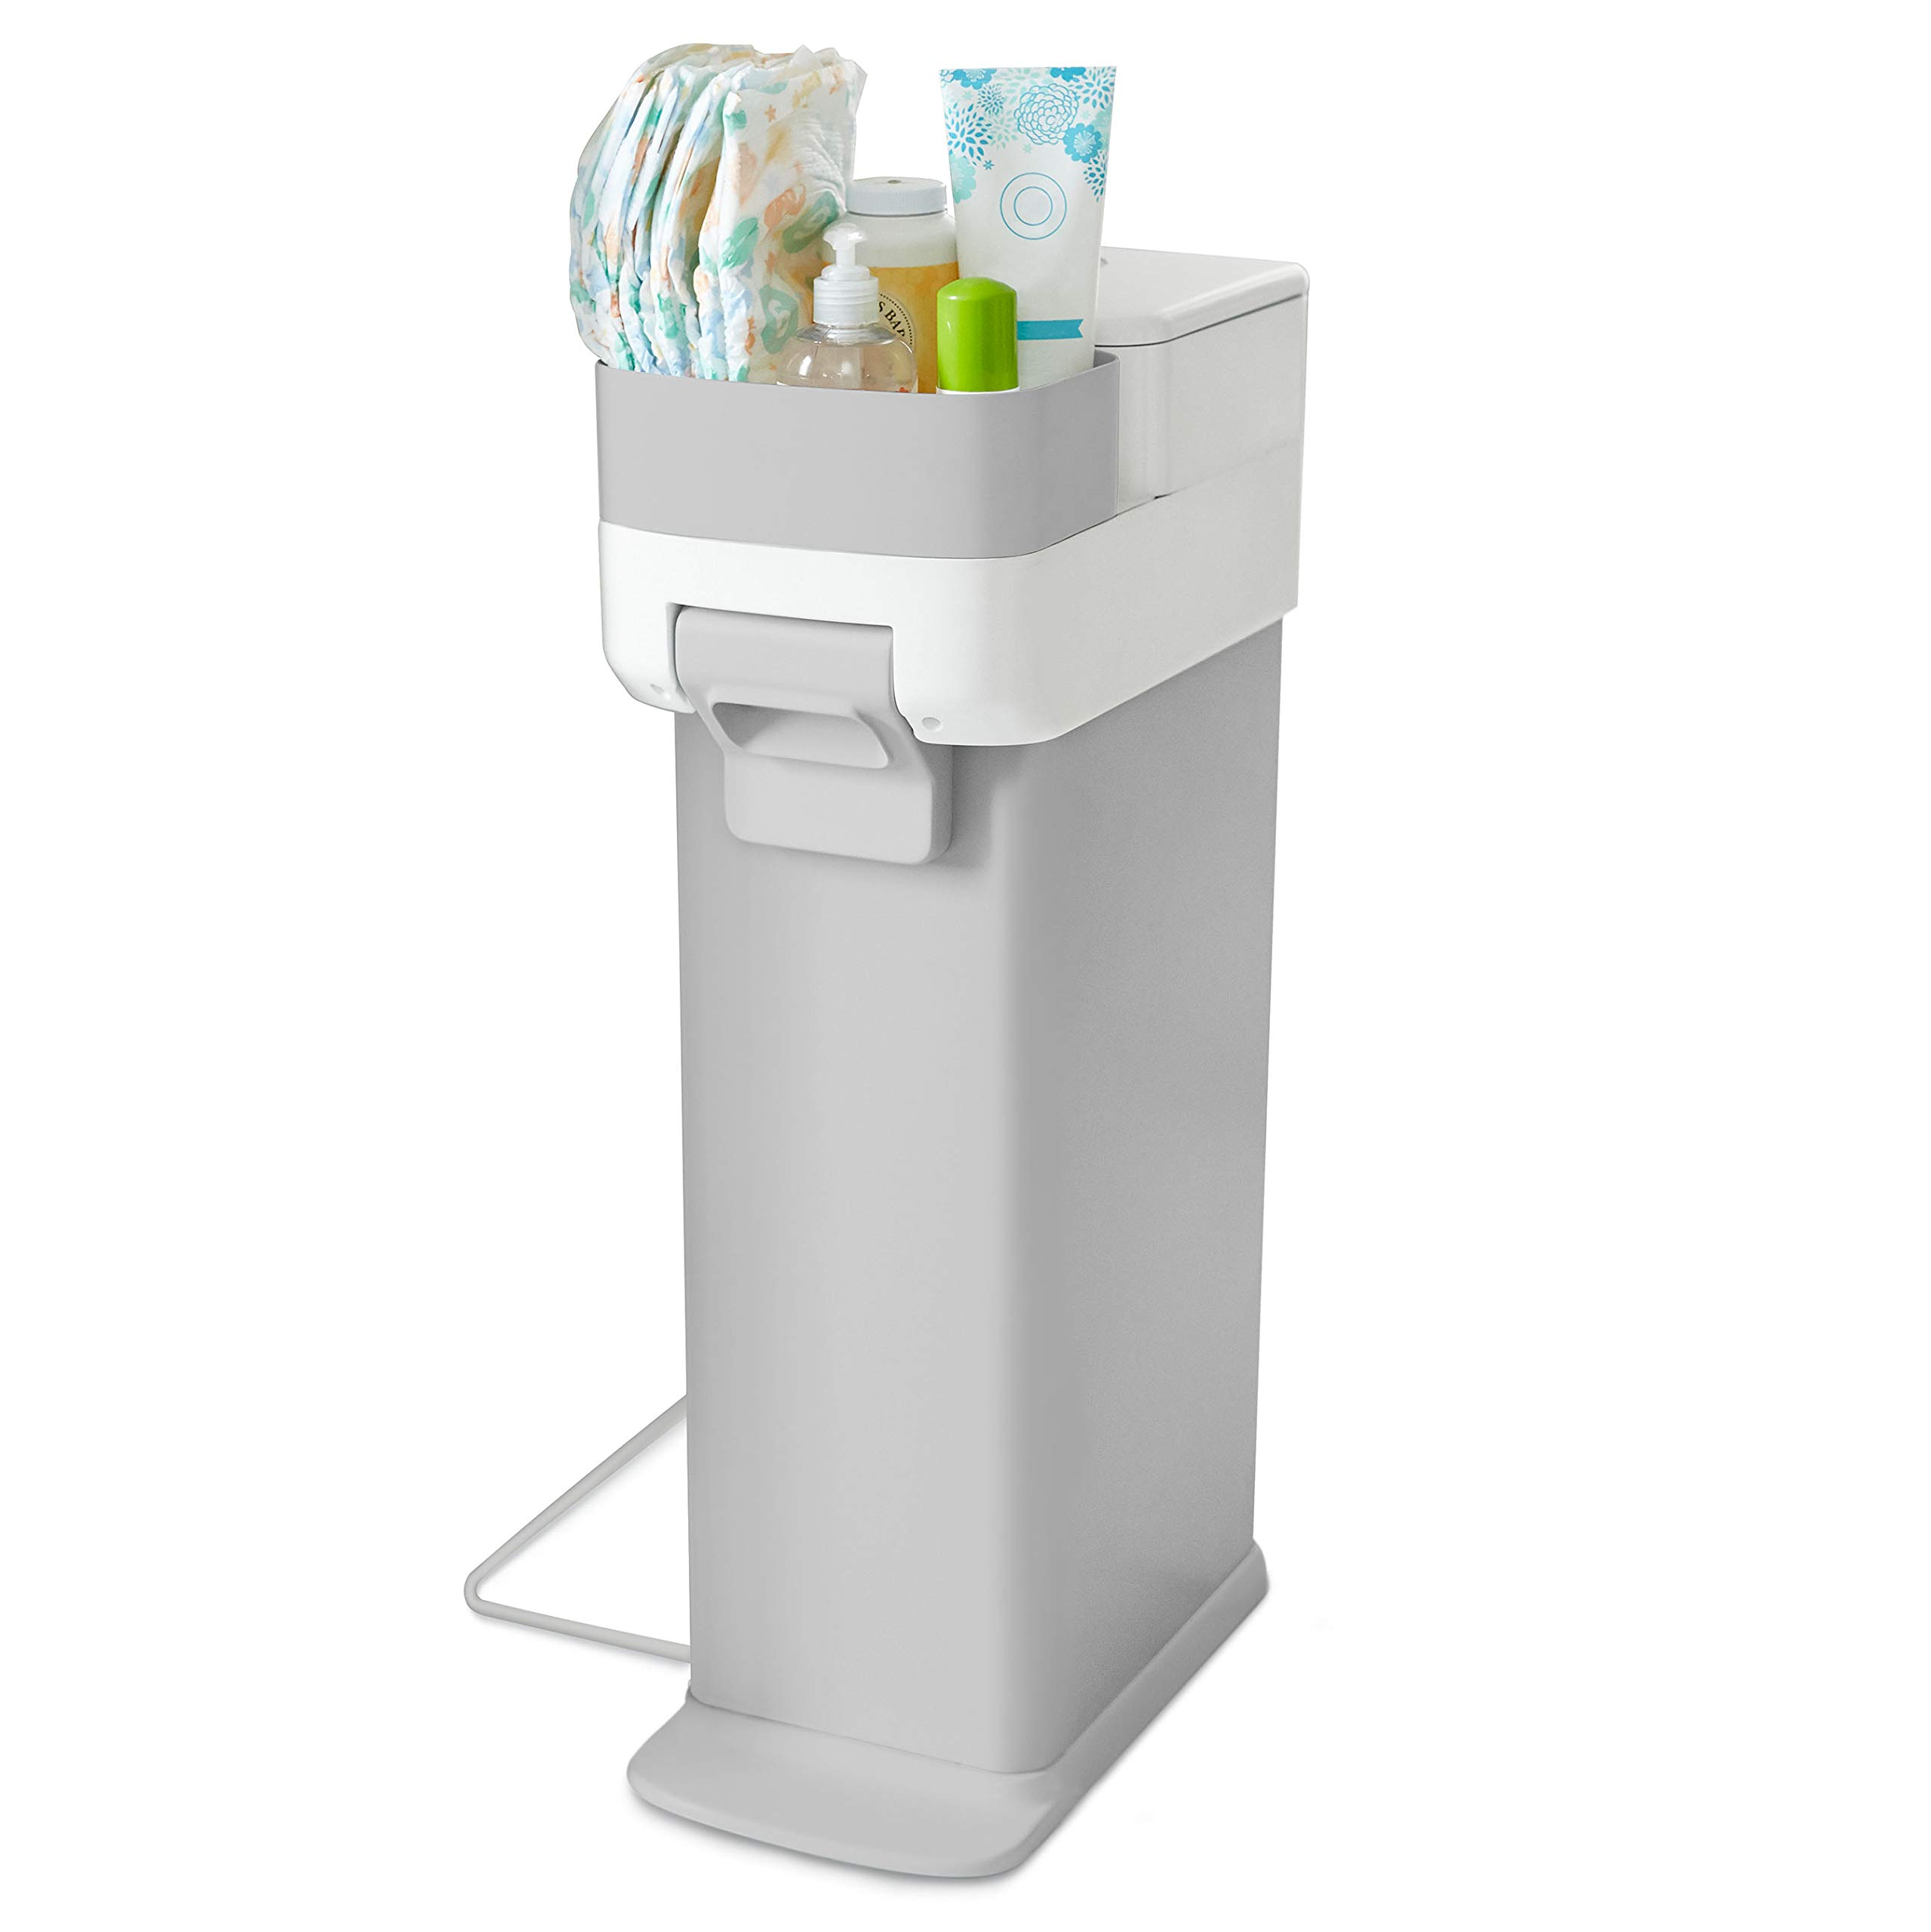 Skip Hop Diaper Pail with Dual Air-Lock, Premium Slim Design, Fits Standard Trash Bags, White